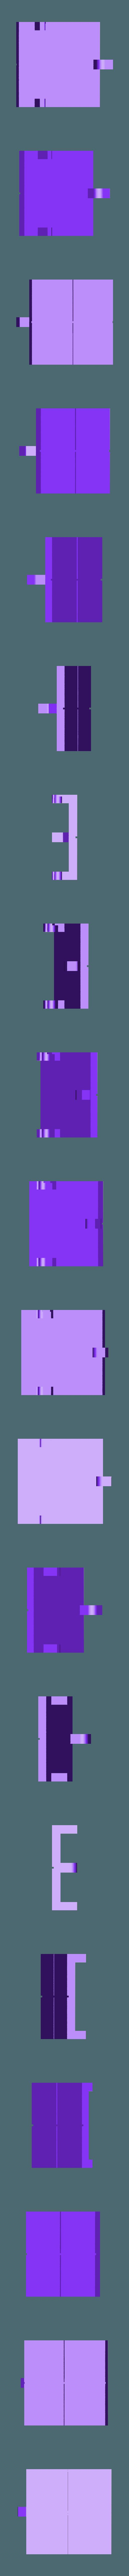 Parte_lateral_corta_SIM.stl Download free STL file Tablero de ajedrez desplegable • 3D print object, alexanderegido